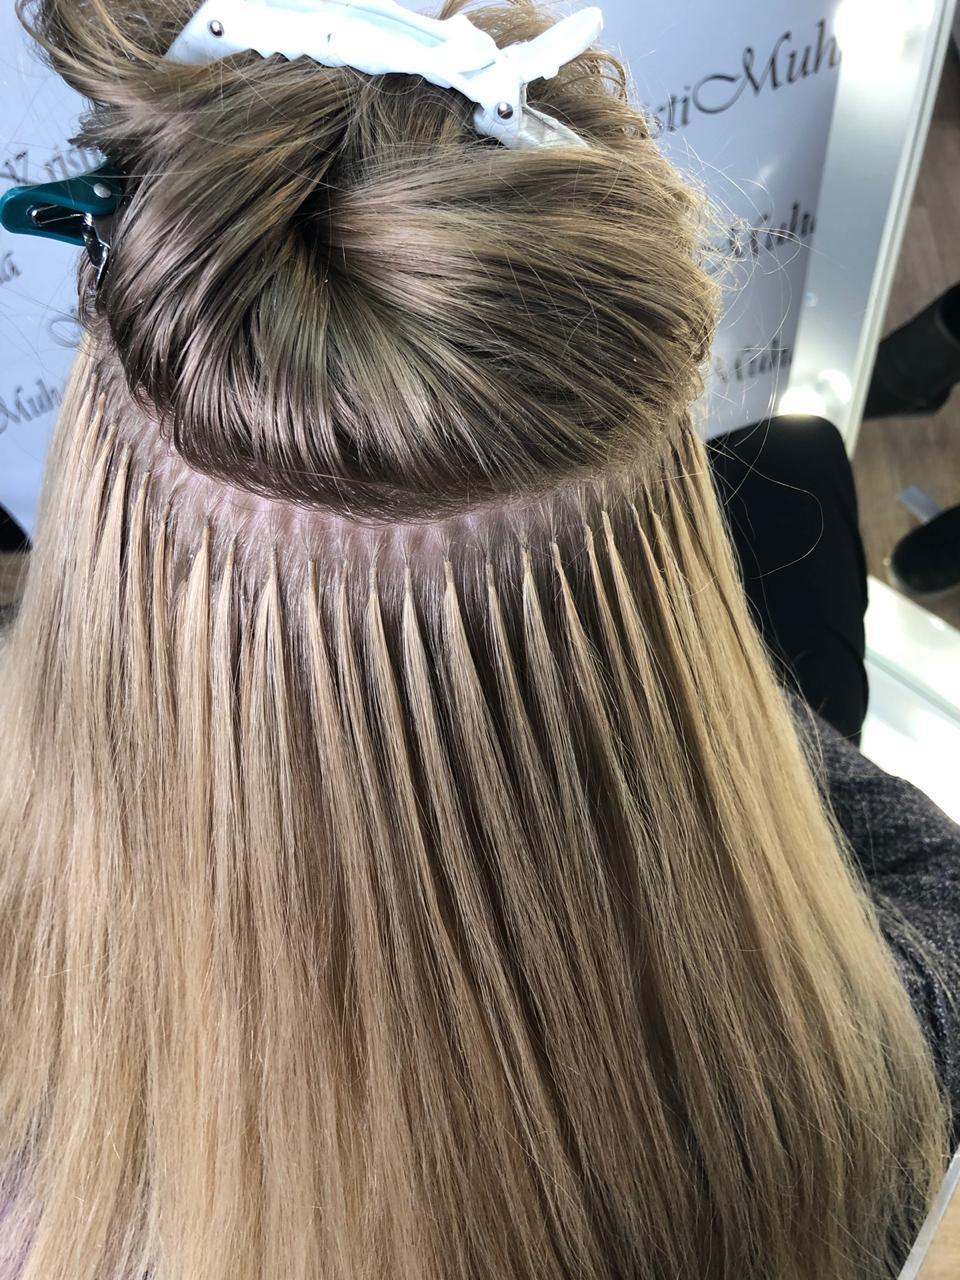 Наращивание волос: виды и технологии